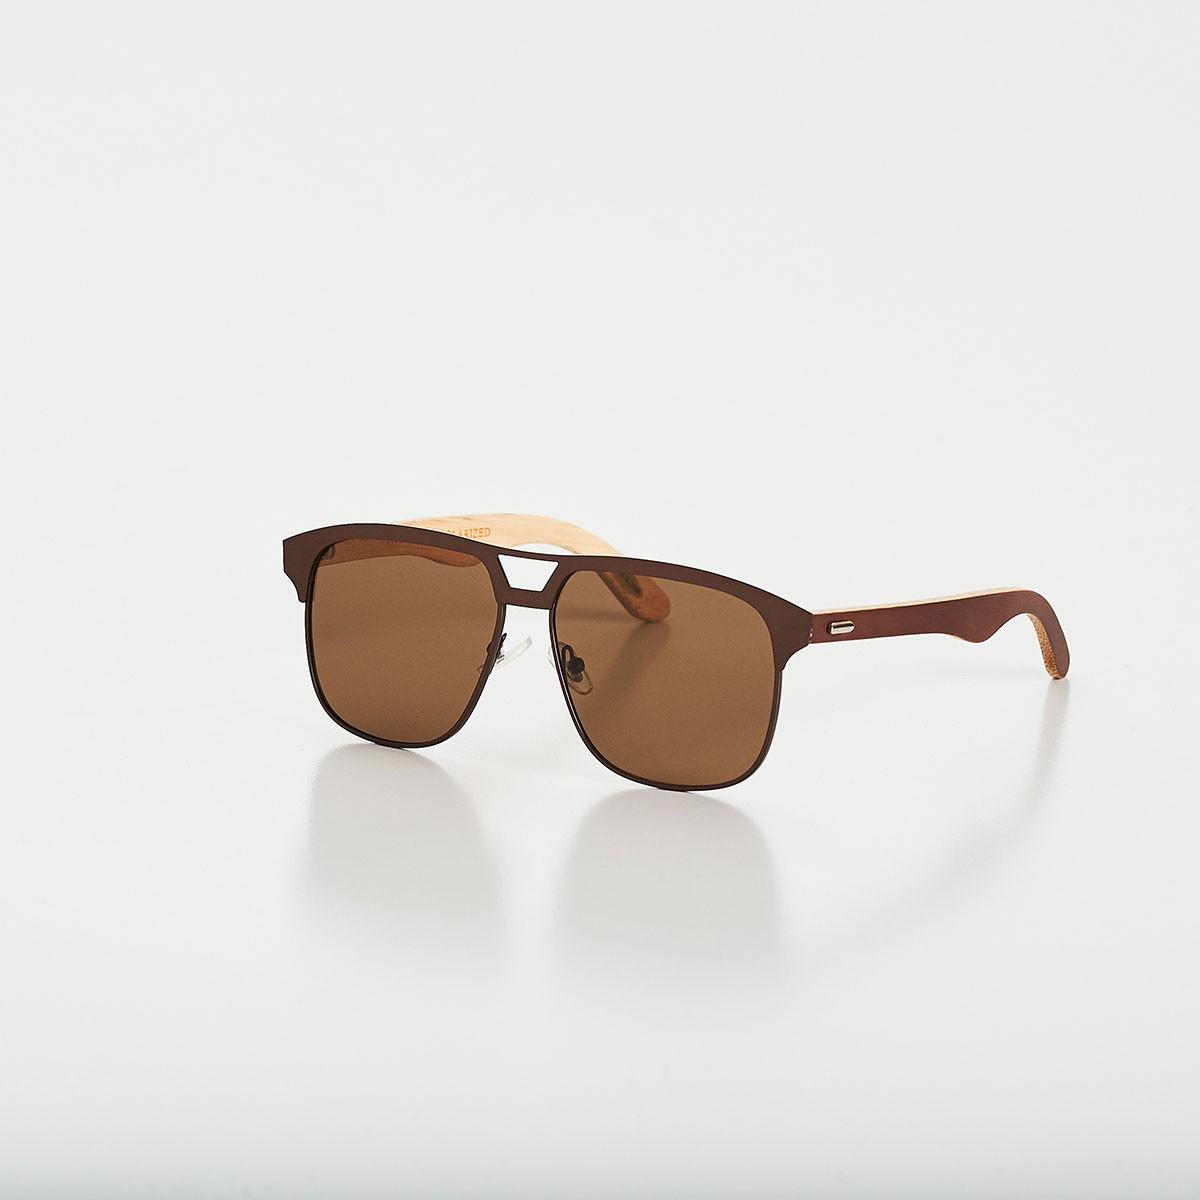 f577b2ebba48c Óculos de Sol Timber Marrom CAJUBRASIL Activewear